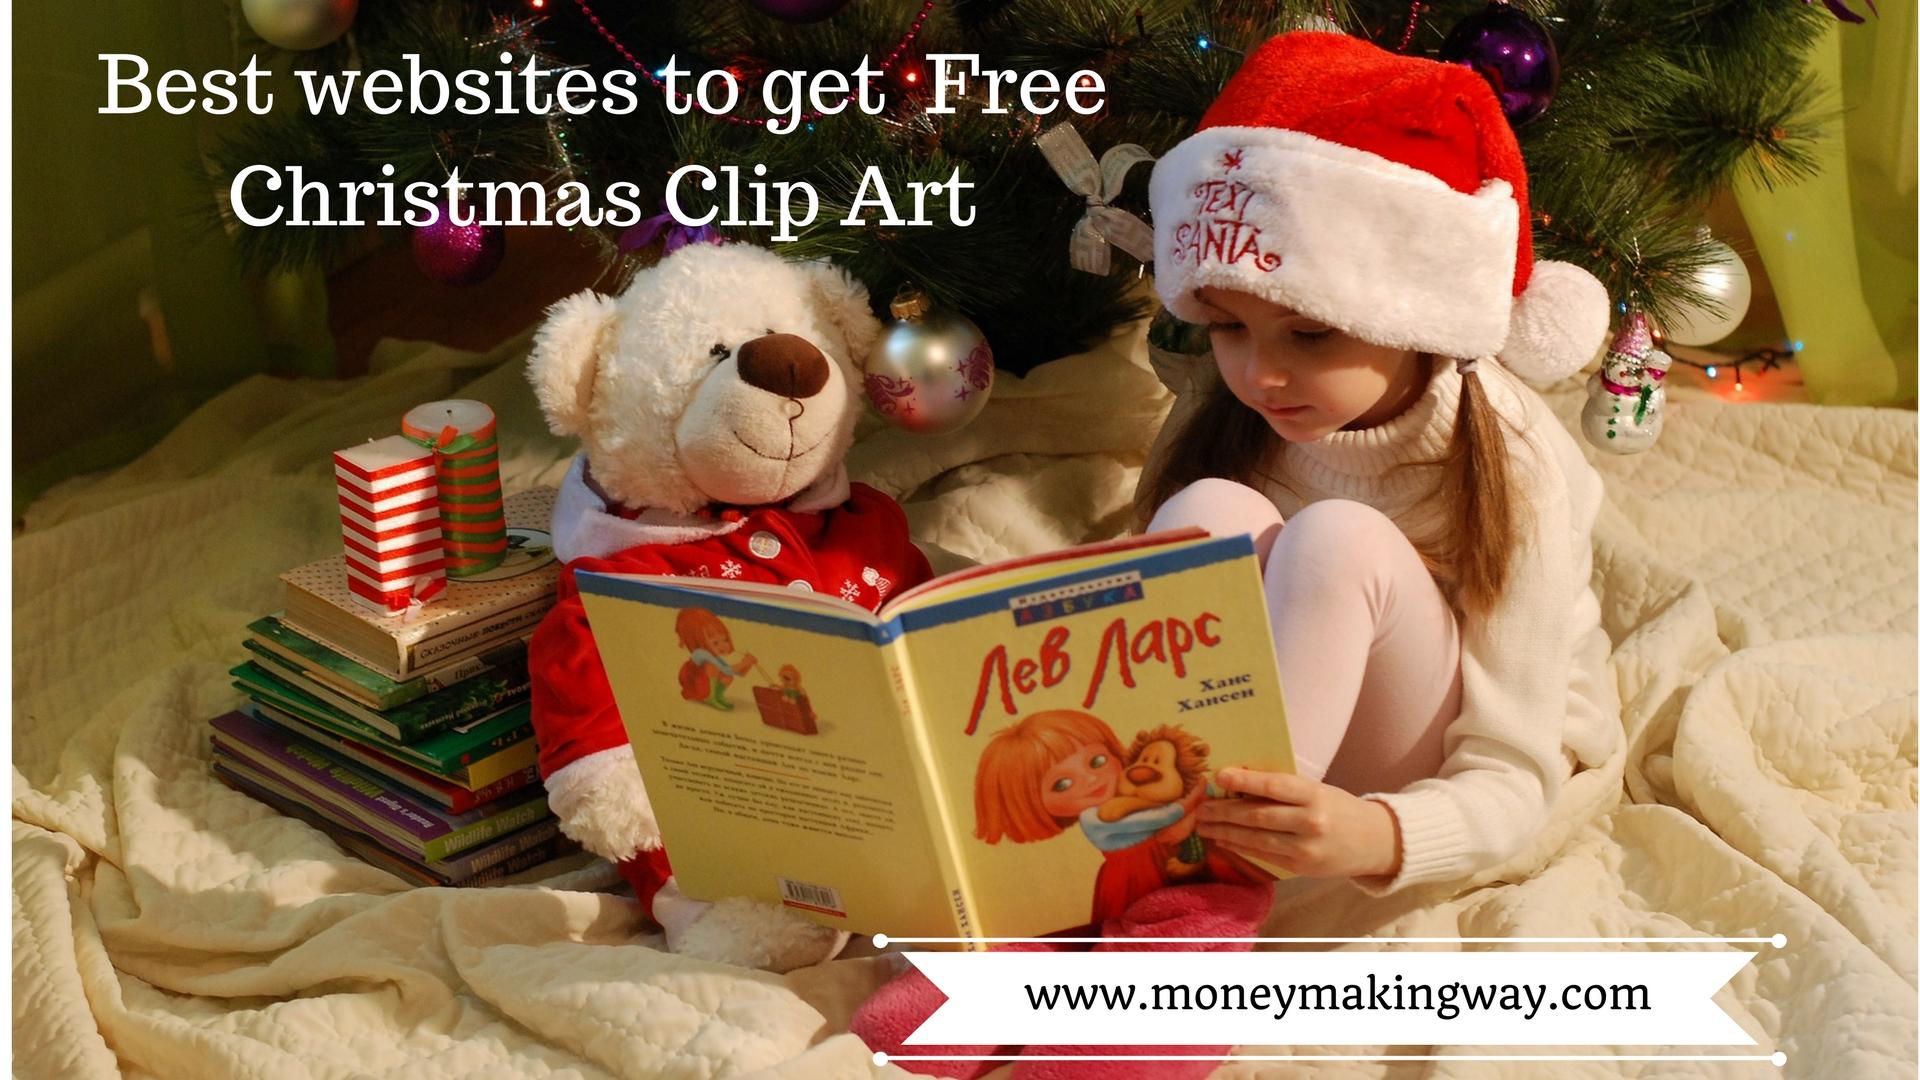 7,951 Free Christmas Clip Art - sheknowsfinance